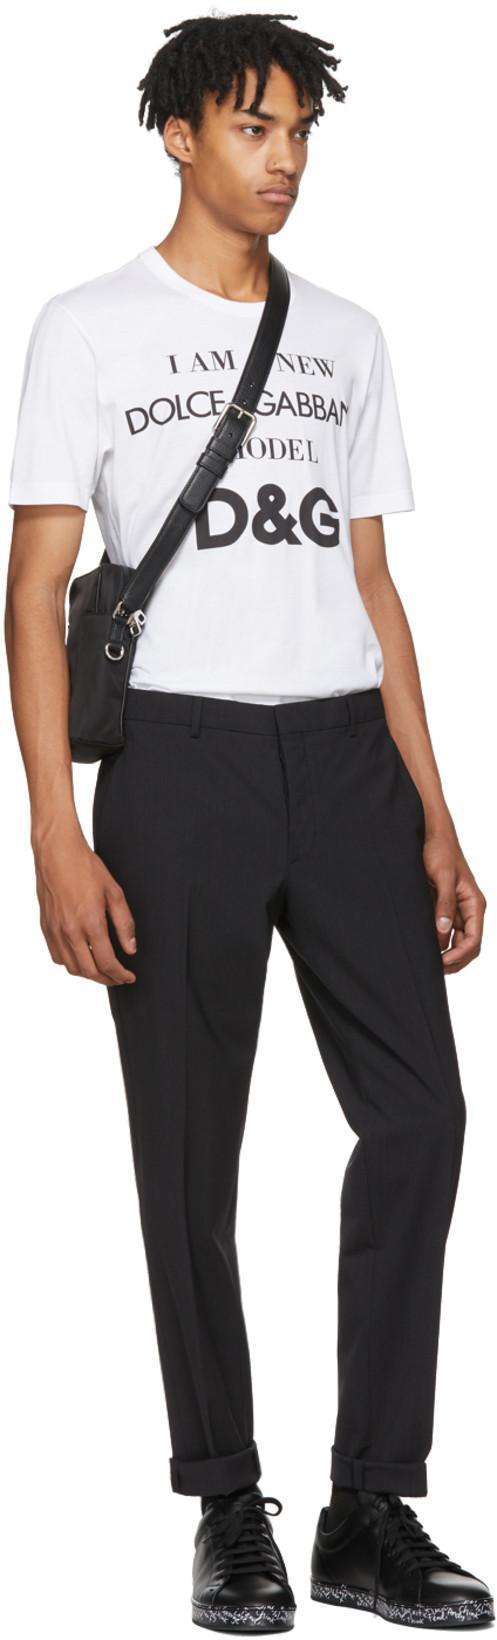 DOLCE   GABBANA Dolce And Gabbana Black Varsity Logo Camera Bag in 8B956  Black c077bcfd0ae41